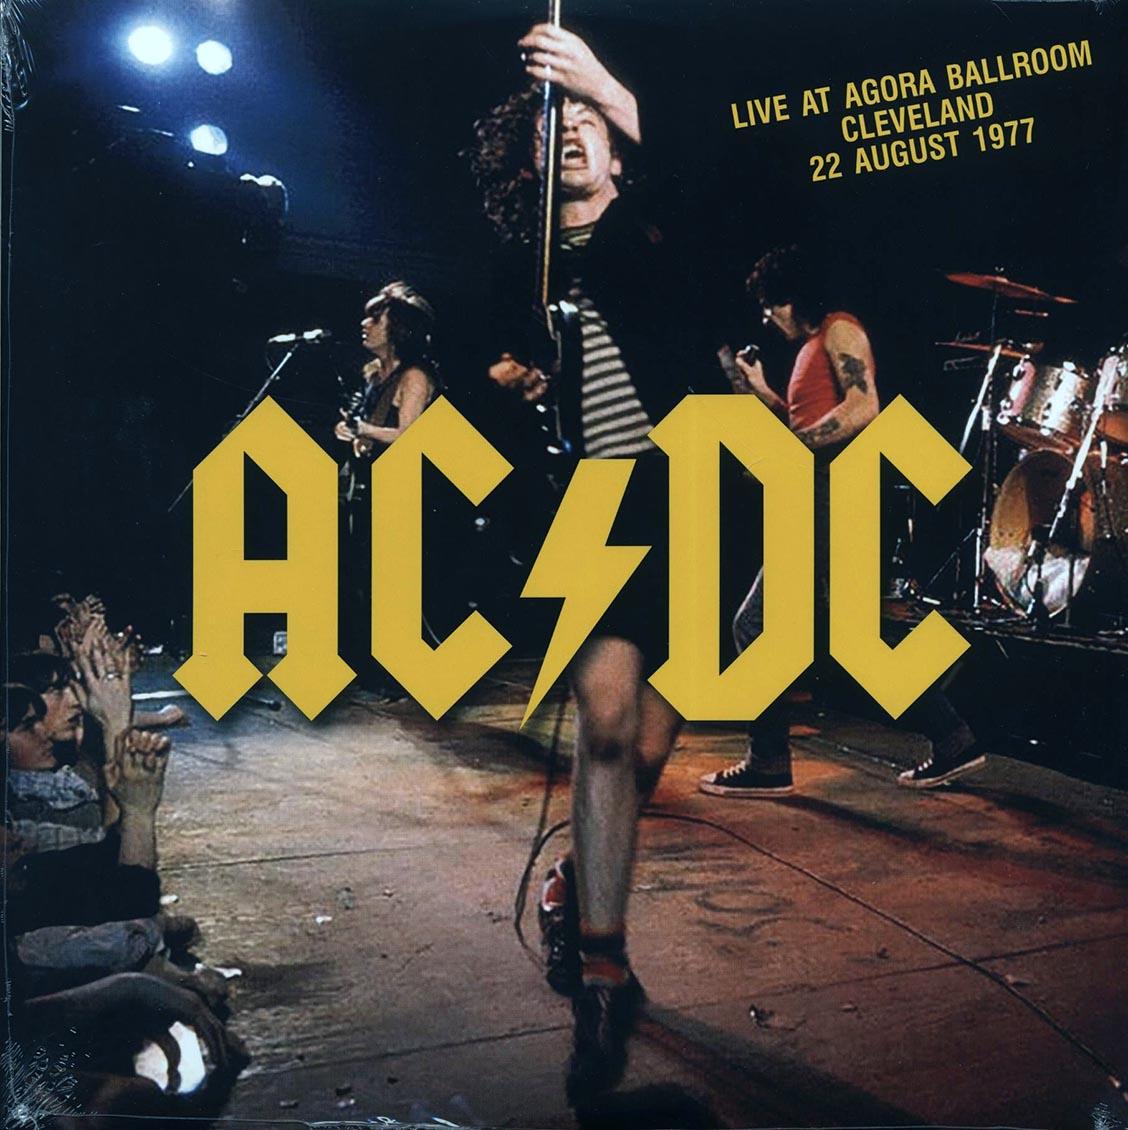 ac/dc live at agora ballroom cleveland 22 august 1977